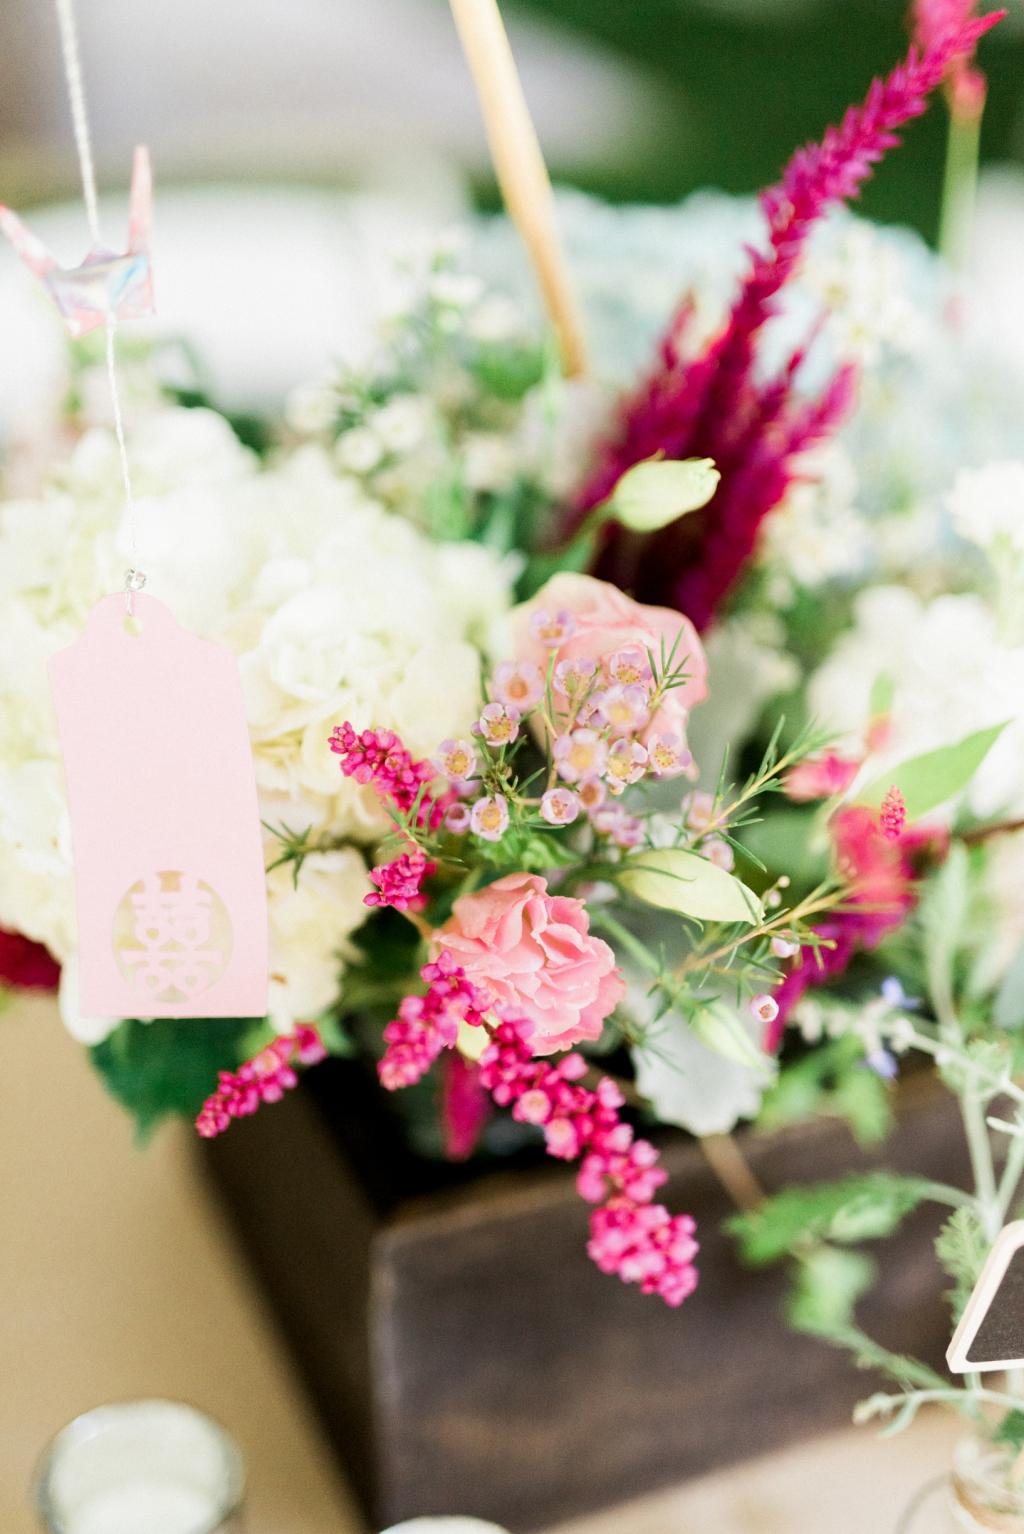 haley-richter-photography-buena-vista-confrence-center-wedding-summer-112